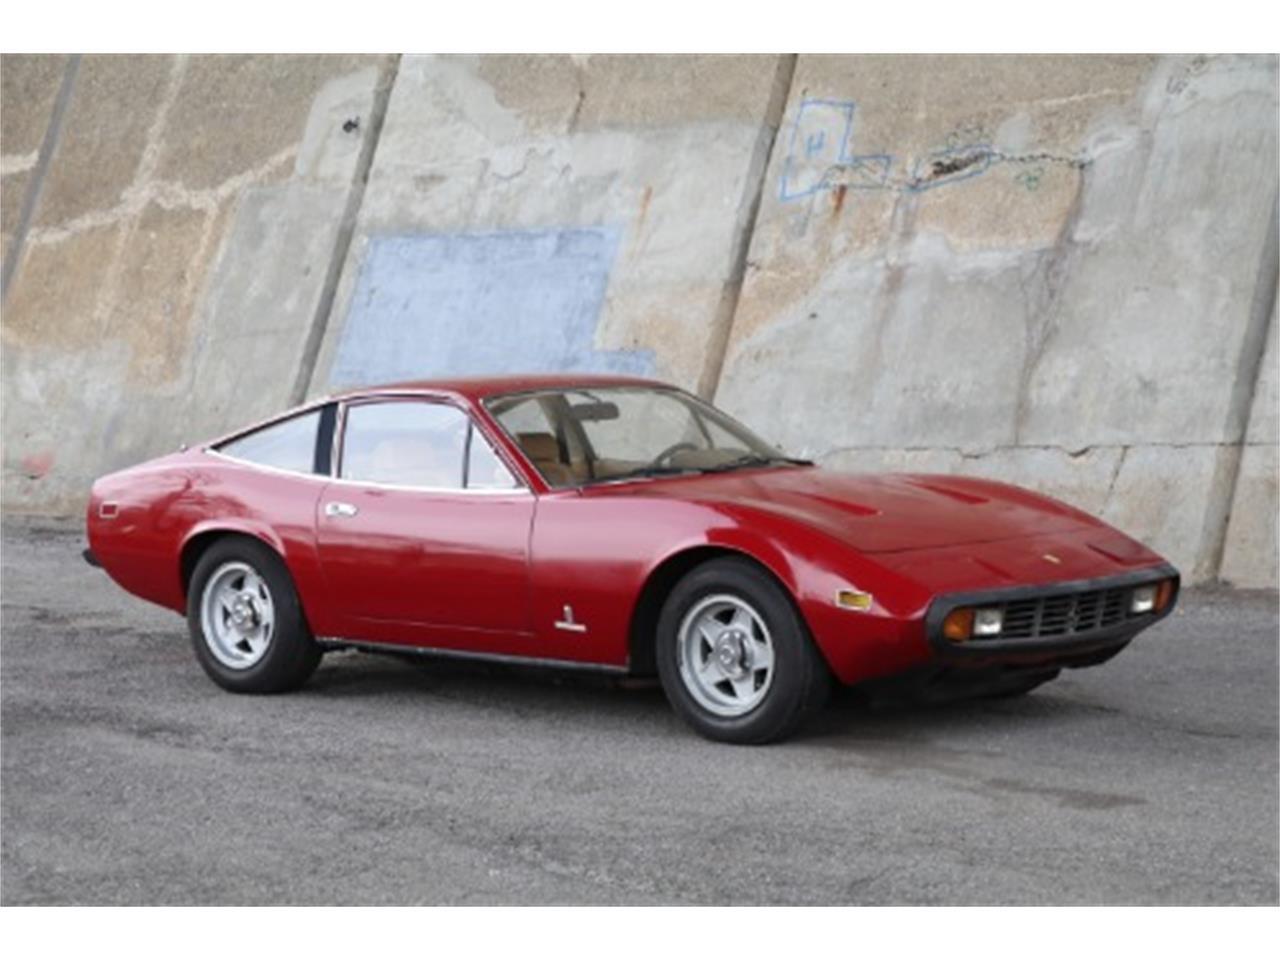 1972 Ferrari 365 GTC/4 (CC-1312341) for sale in Astoria, New York